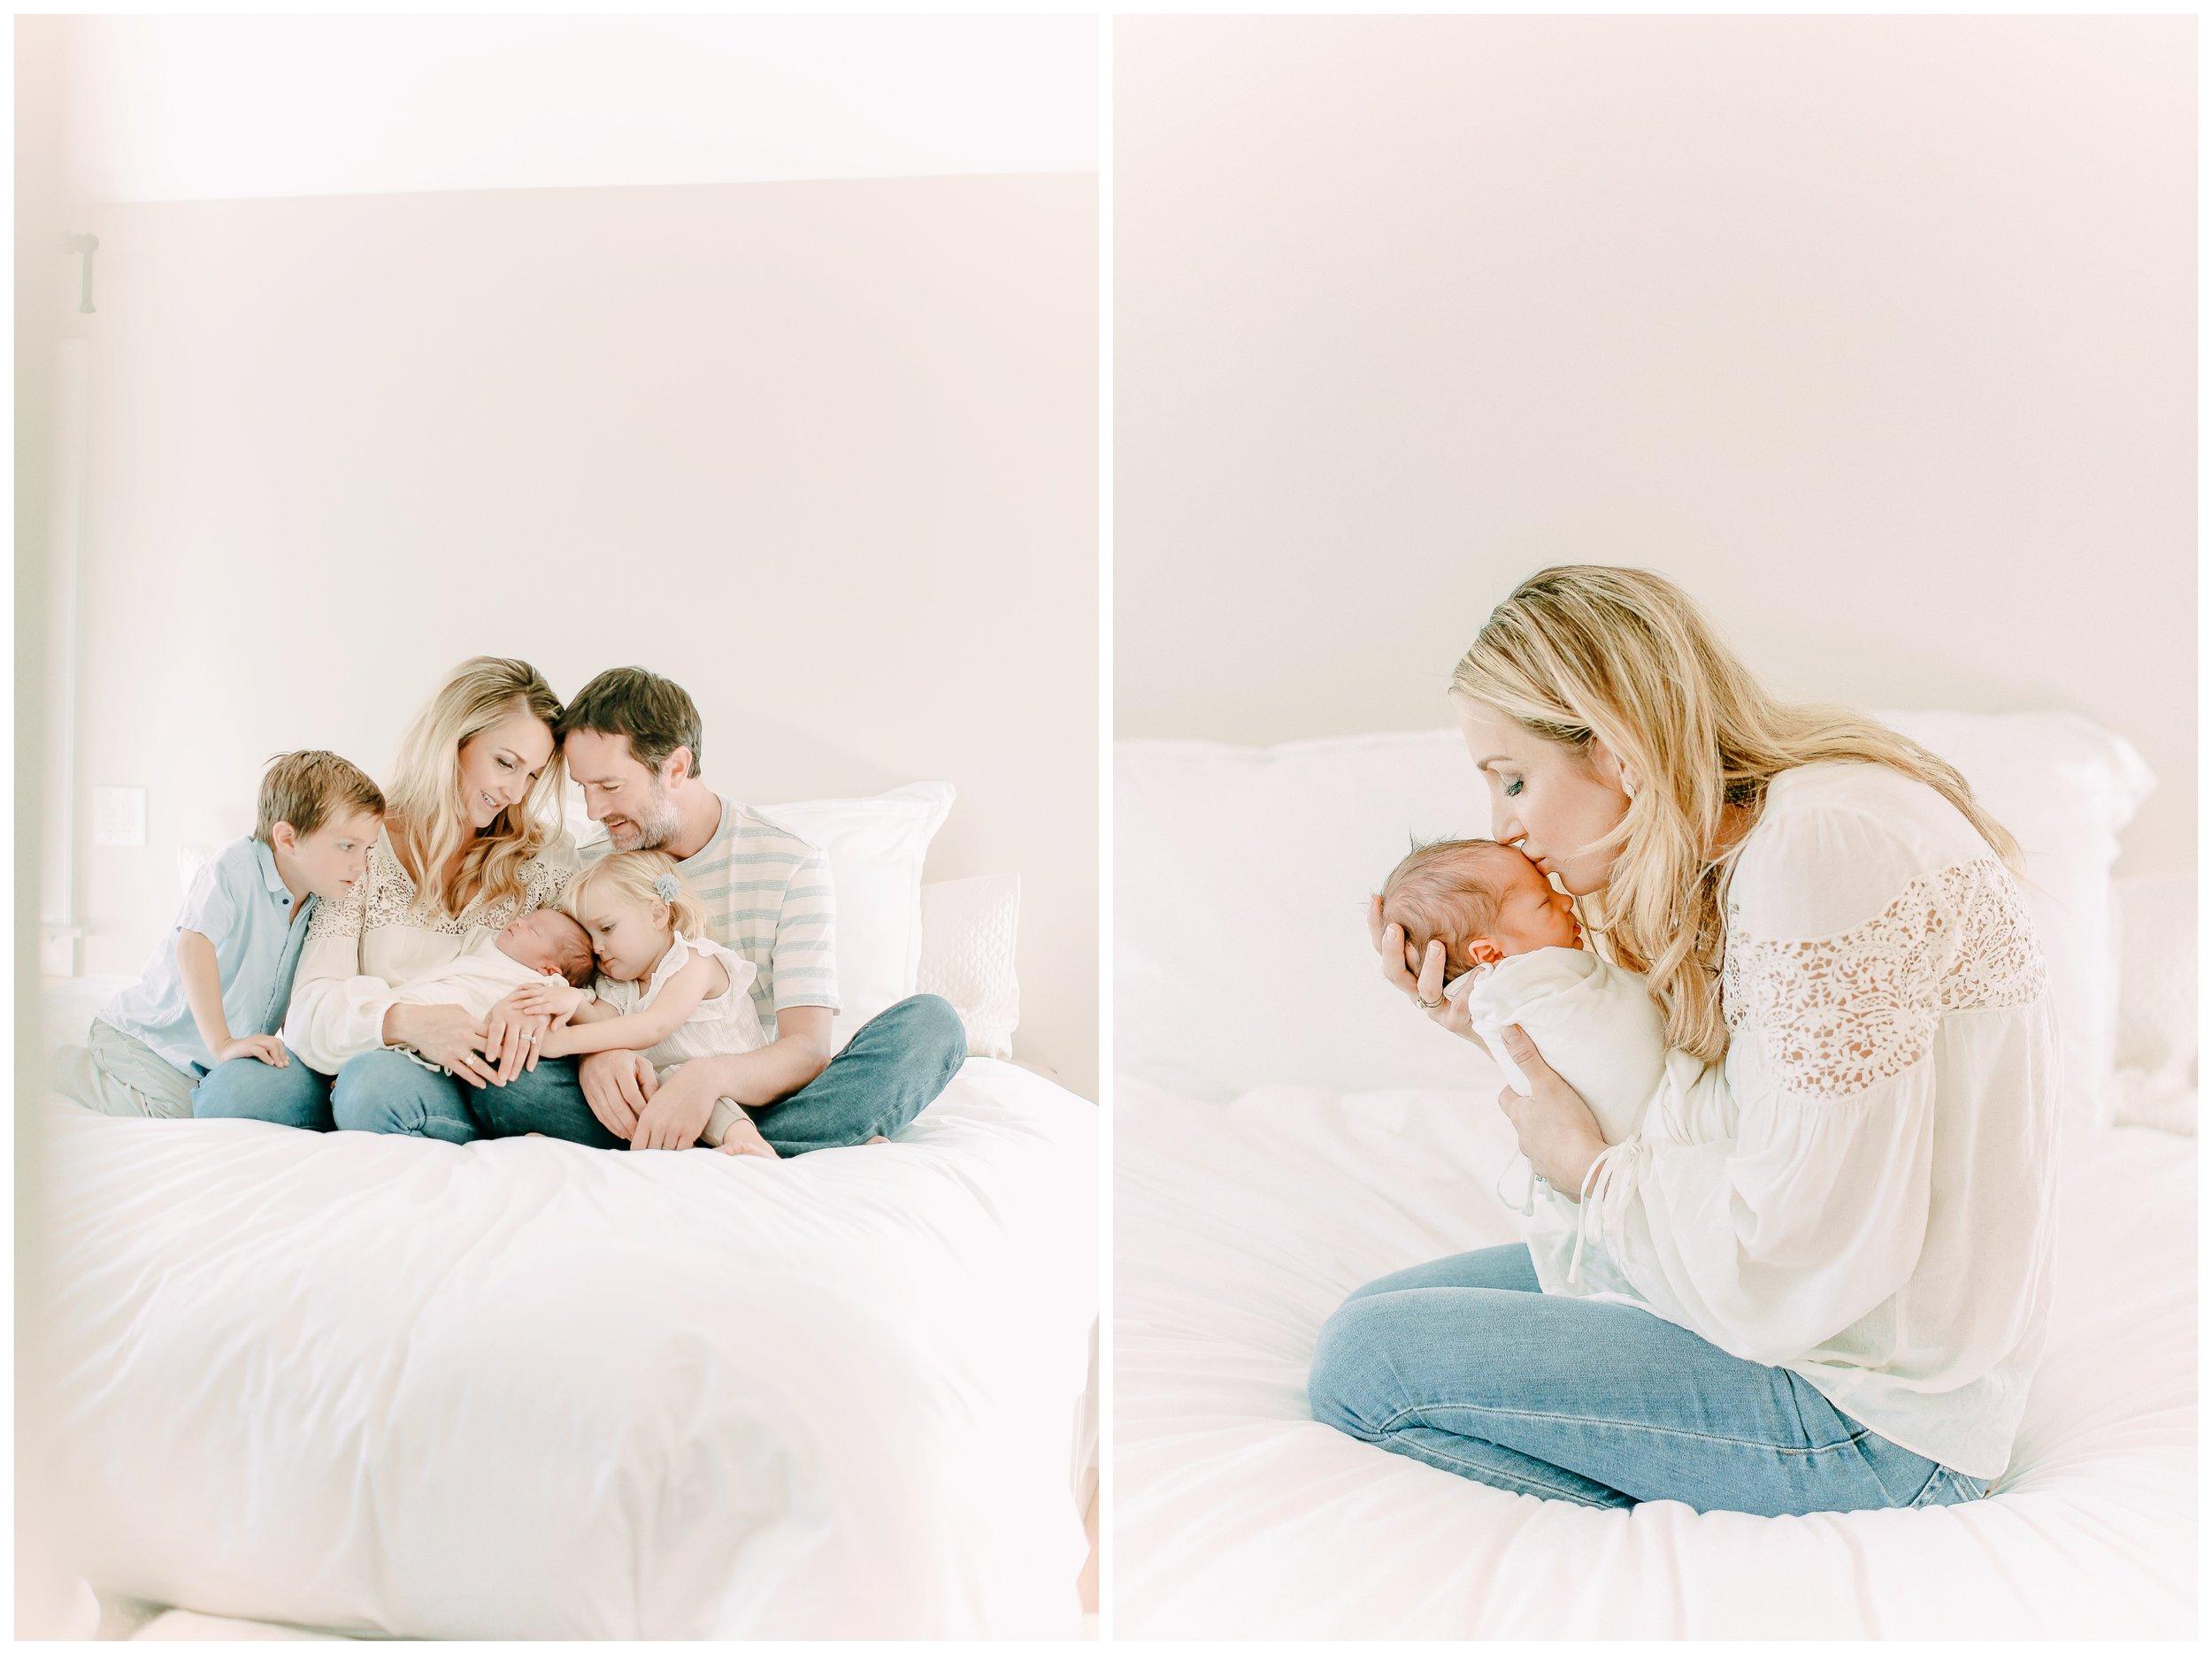 Family-Session_in-home-Orange_county_family_and_newborn-photographer_cori_kleckner_photography_Newport_beach_family_photographer__0811.jpg